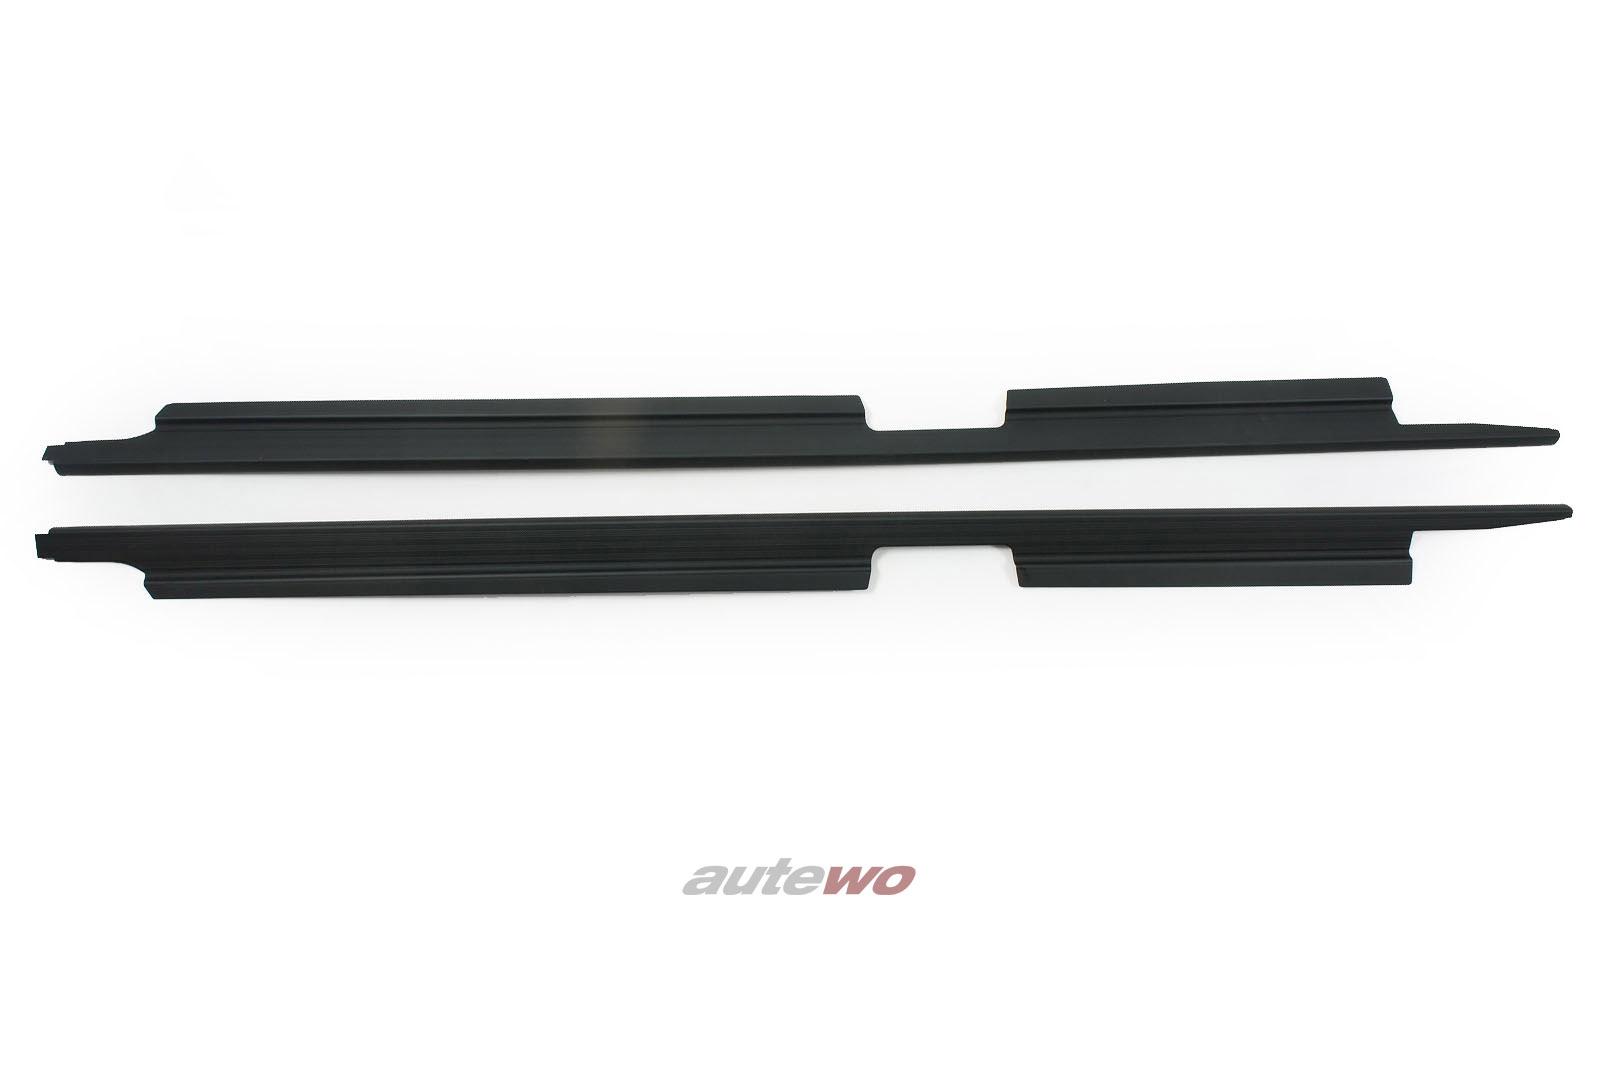 4A0853491 & 4A0853492 NEU Audi 100/S4/A6/S6/S6+ C4 Einstiegsleisten